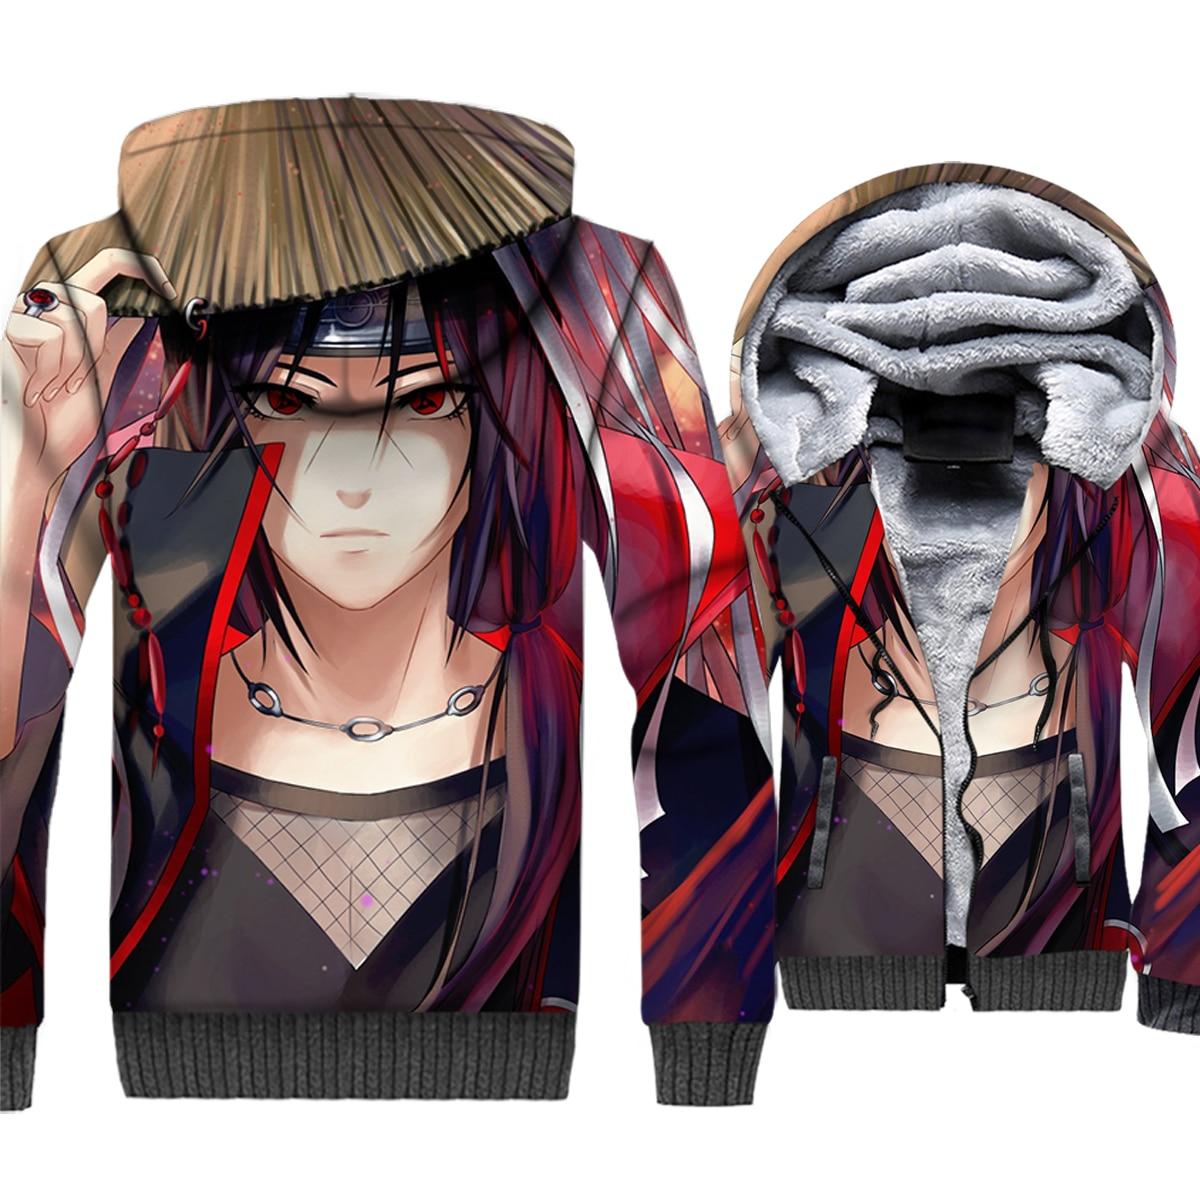 Sasuke Hoodies Men Naruto Uzumaki 3D Jacket Japan Anime Harajuku Sweatshirt Winter Thick Fleece Zipper Coat Hipster Sportswear